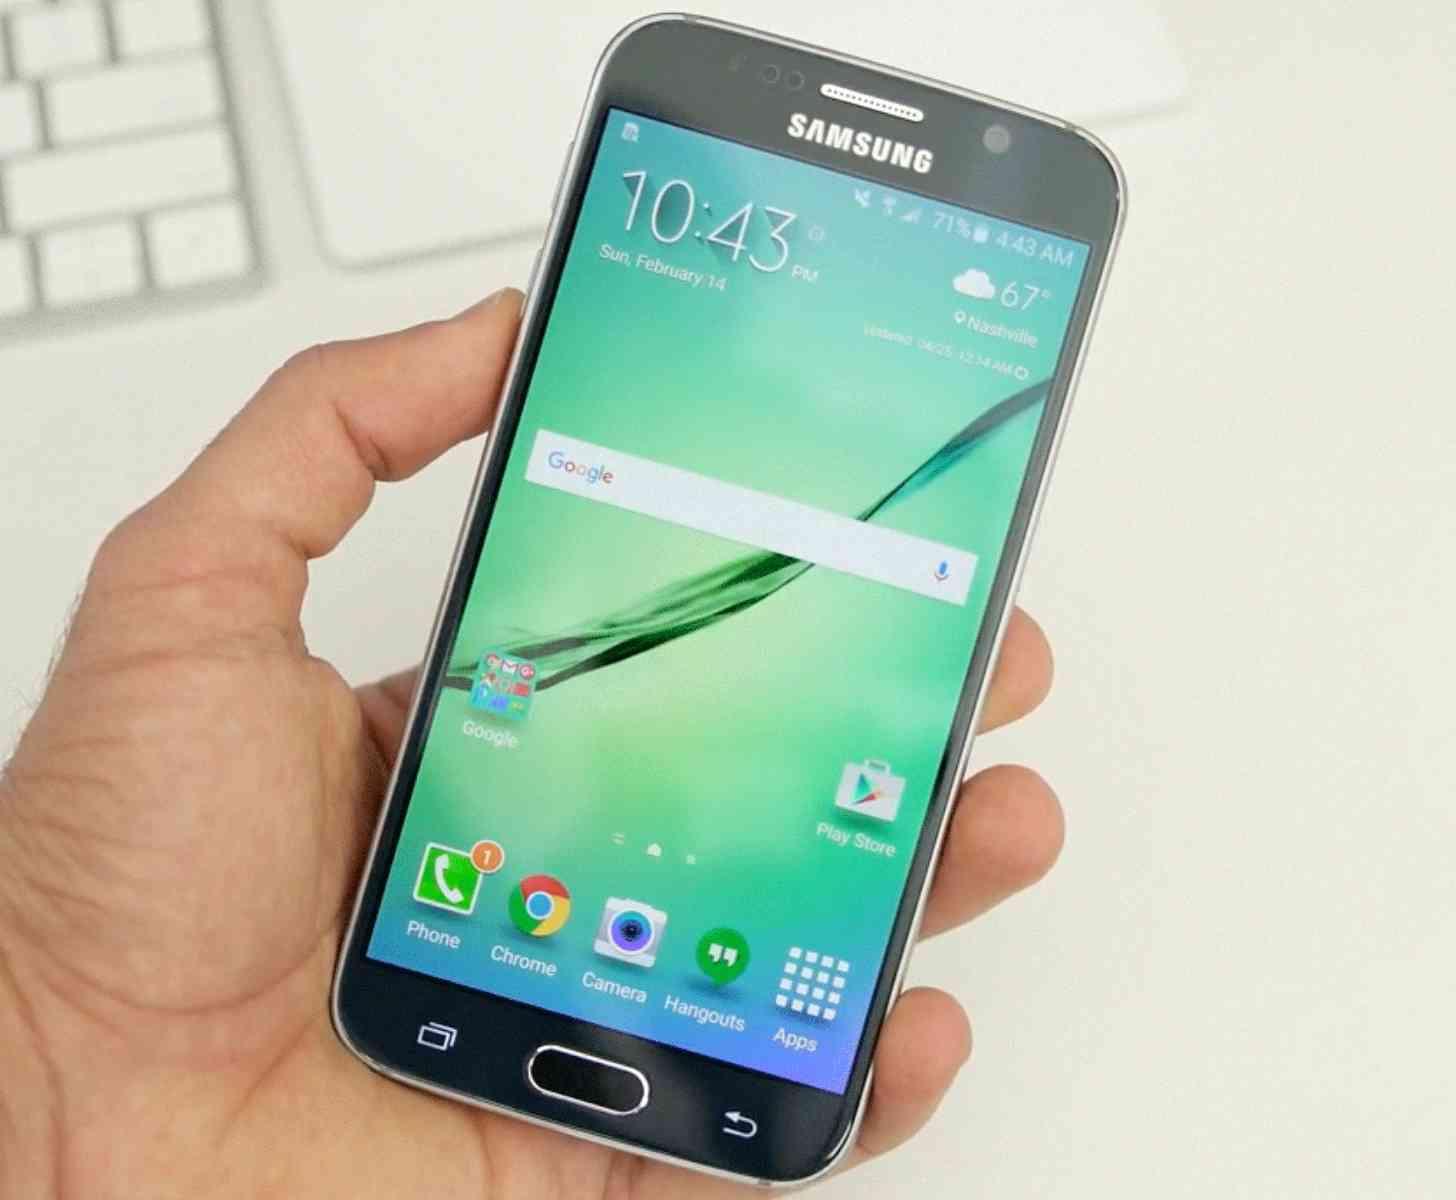 Samsung Galaxy S6 hands-on